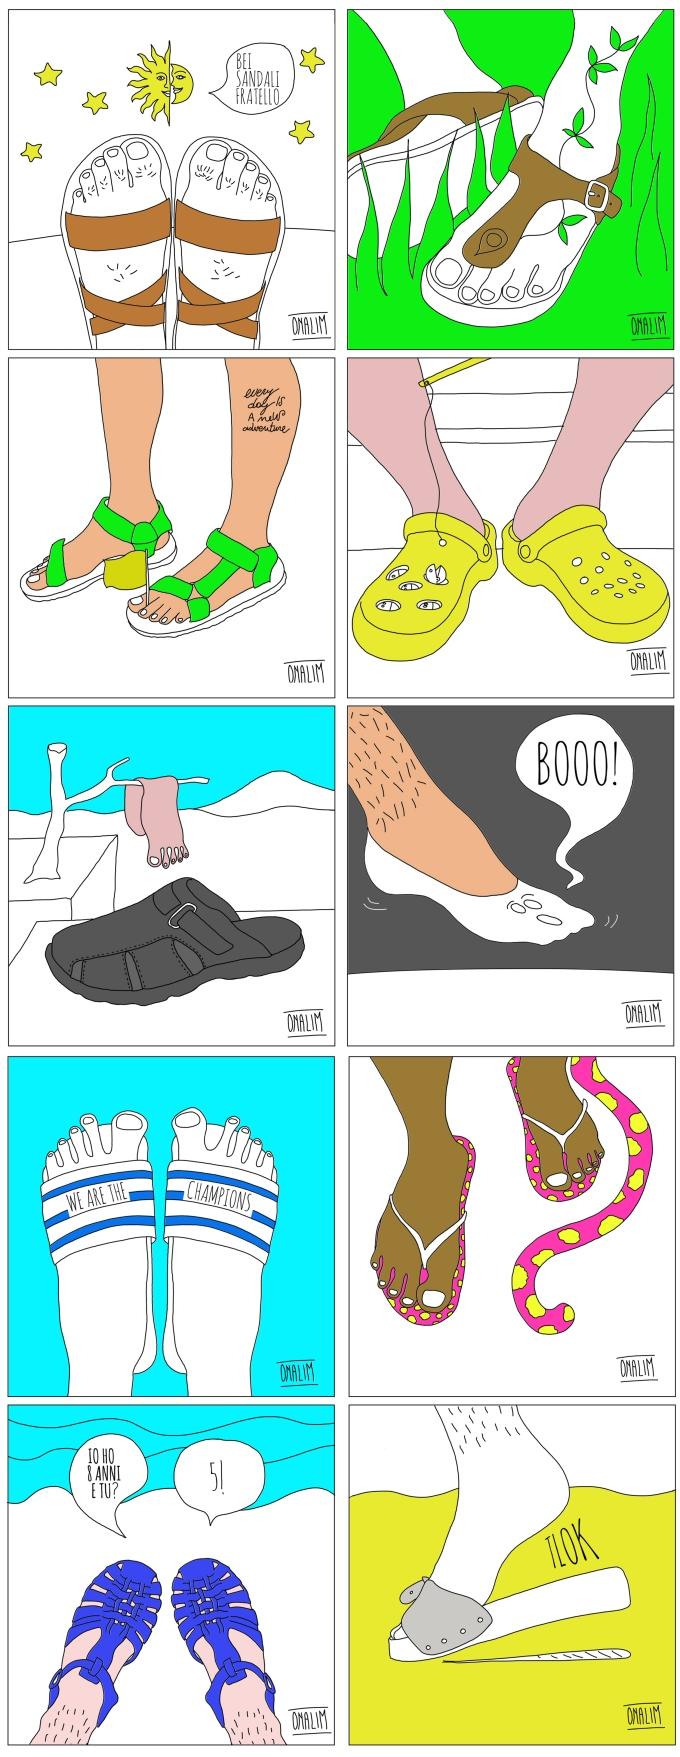 illustrazioni gq